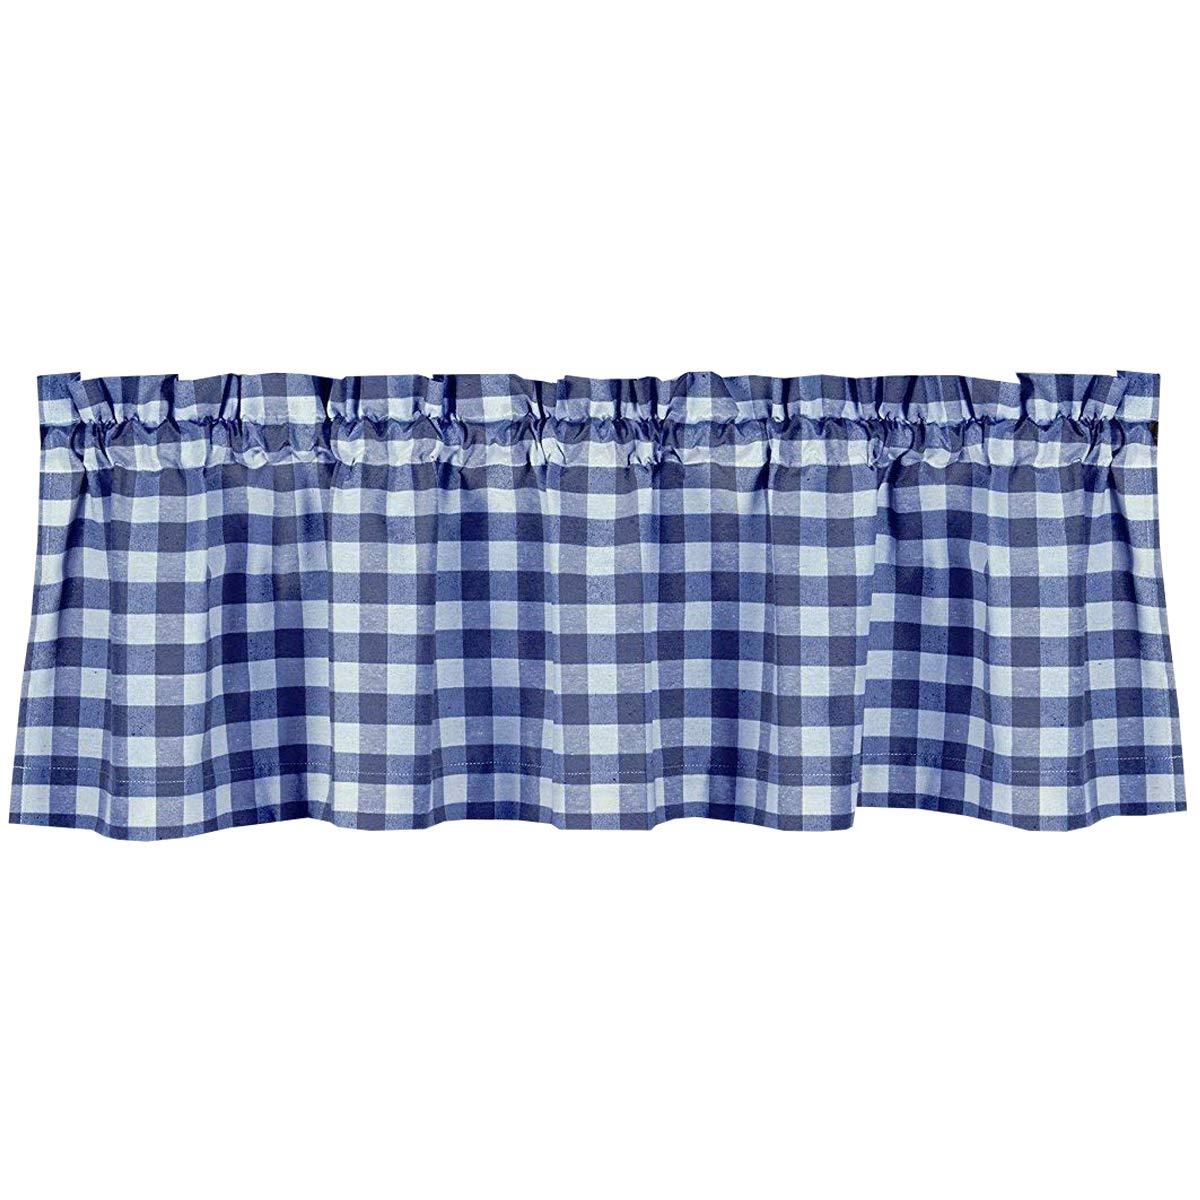 lovemyfabric Poly Cotton Gingham Checkered Plaid Design Kitchen Curtain Valance Window Treatment-Royal Blue